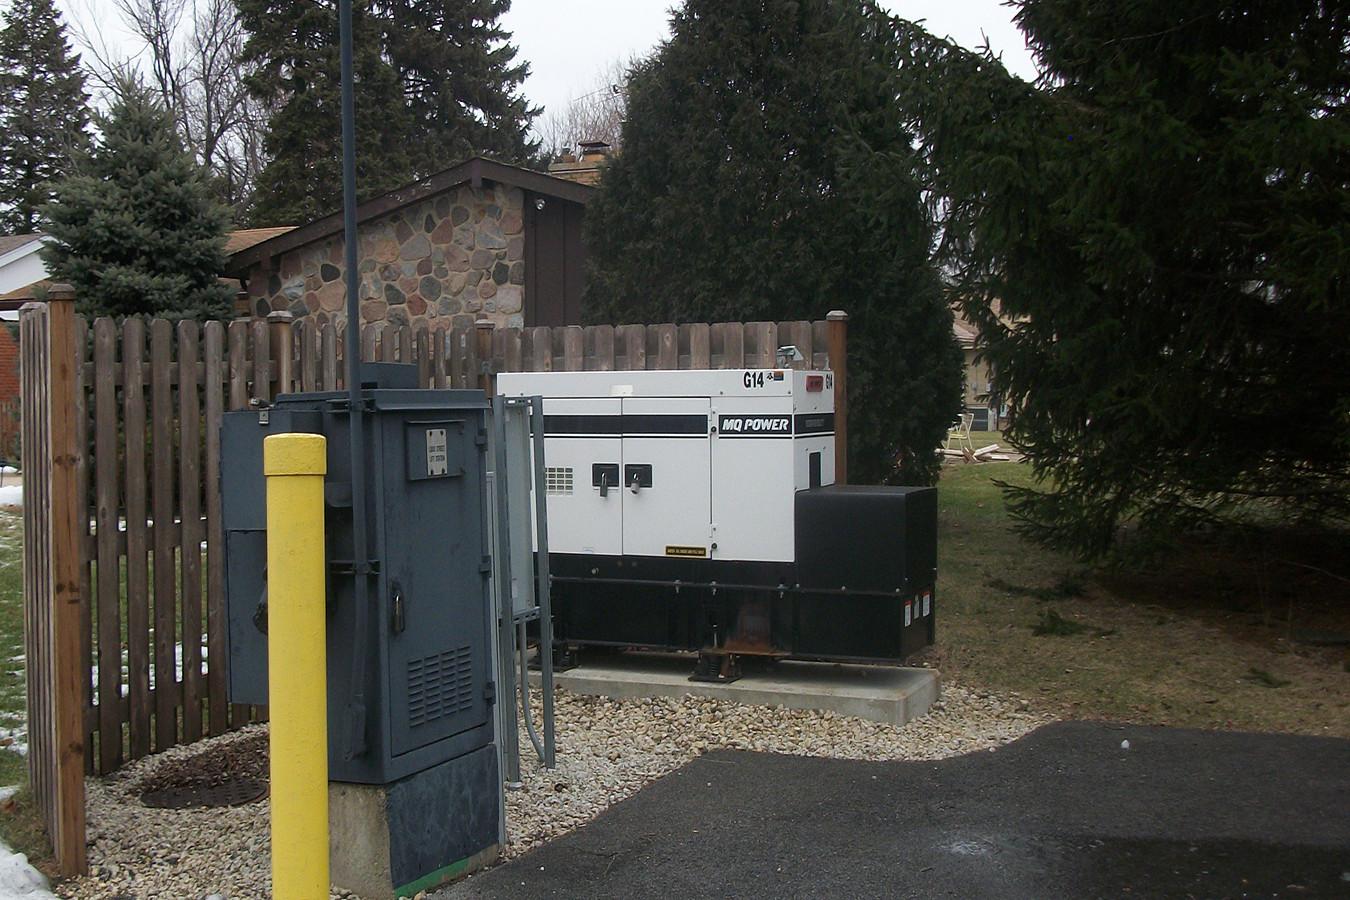 William Street Relief Station | Ciorba Group